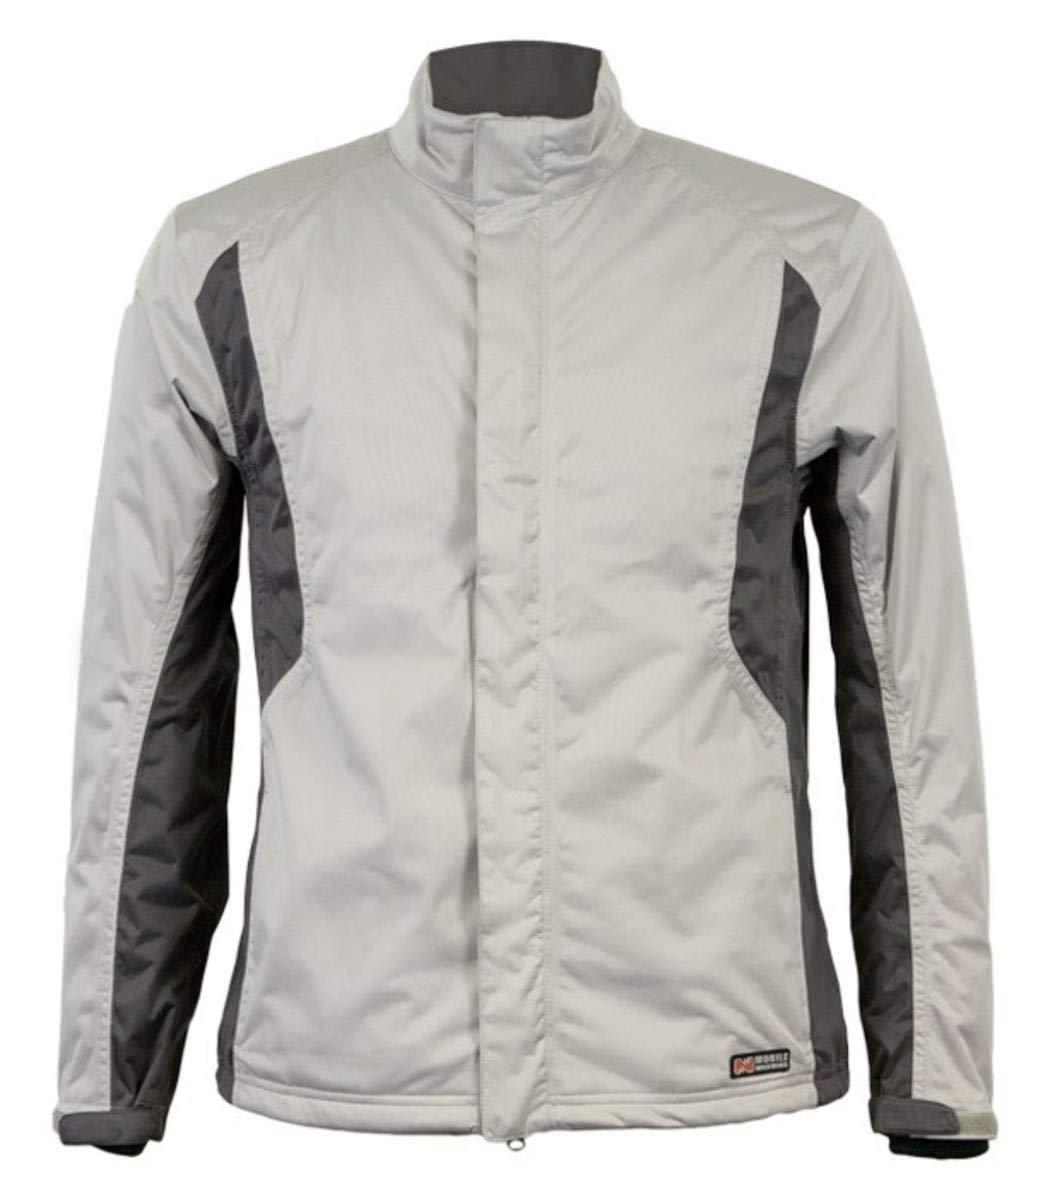 MOBILE WARMING Men's Balmore Heated Rain Jacket (Silver/Gunmetal, Small)